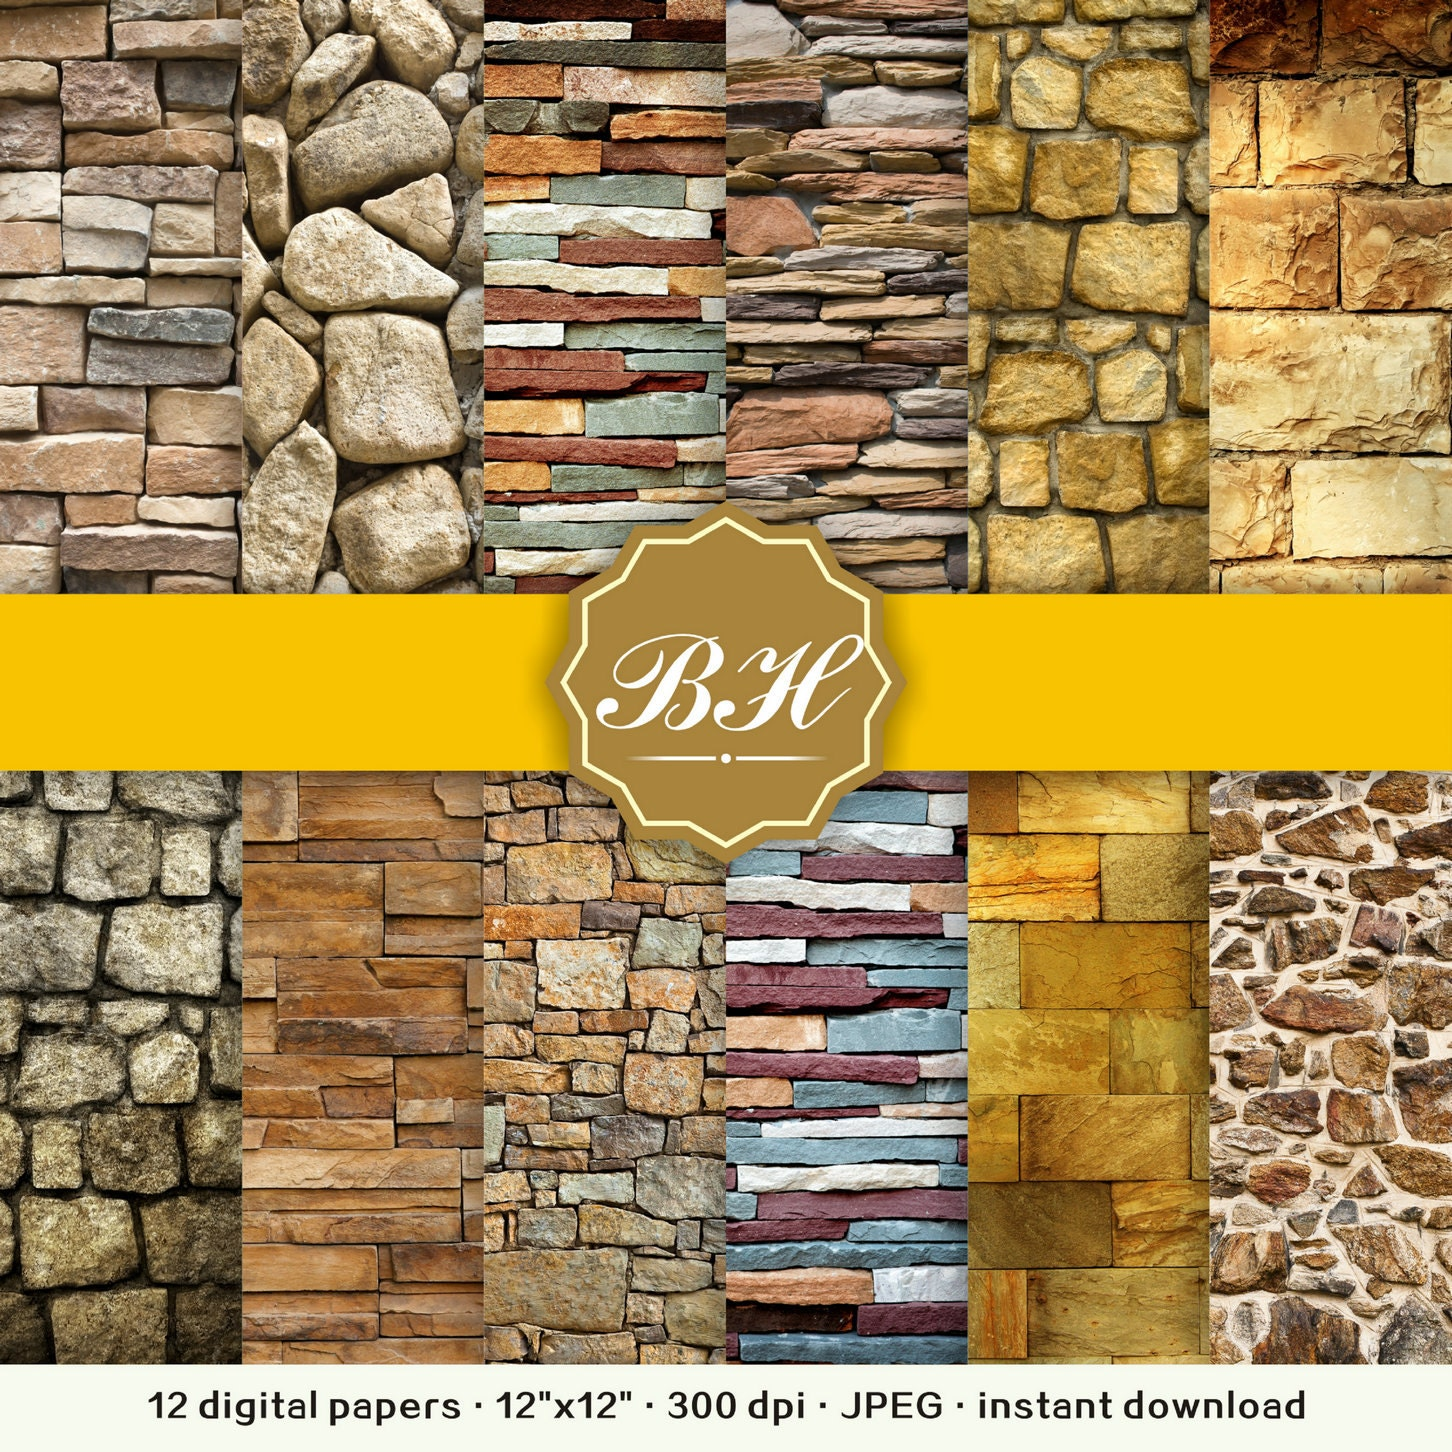 Paper Stone Walls : Wall digital paper stone rustic